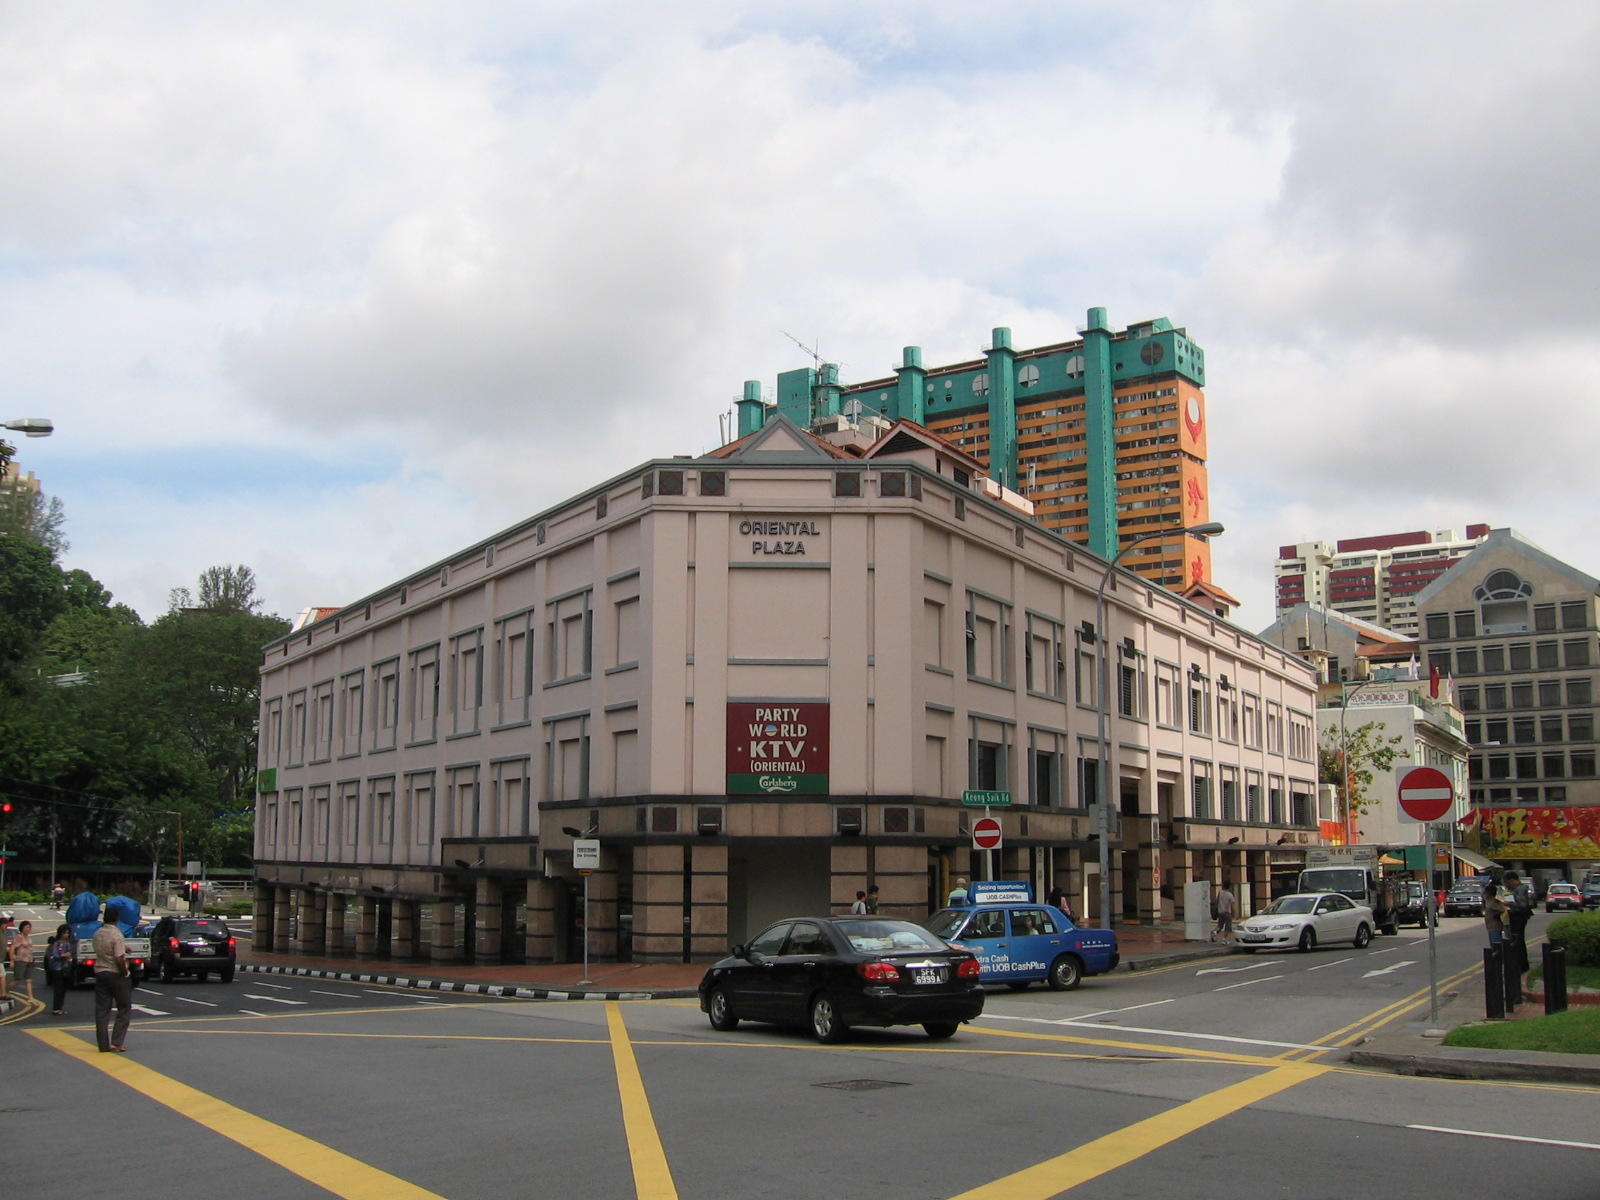 Redistribution >> File:Oriental Plaza, Dec 05.JPG - Wikimedia Commons